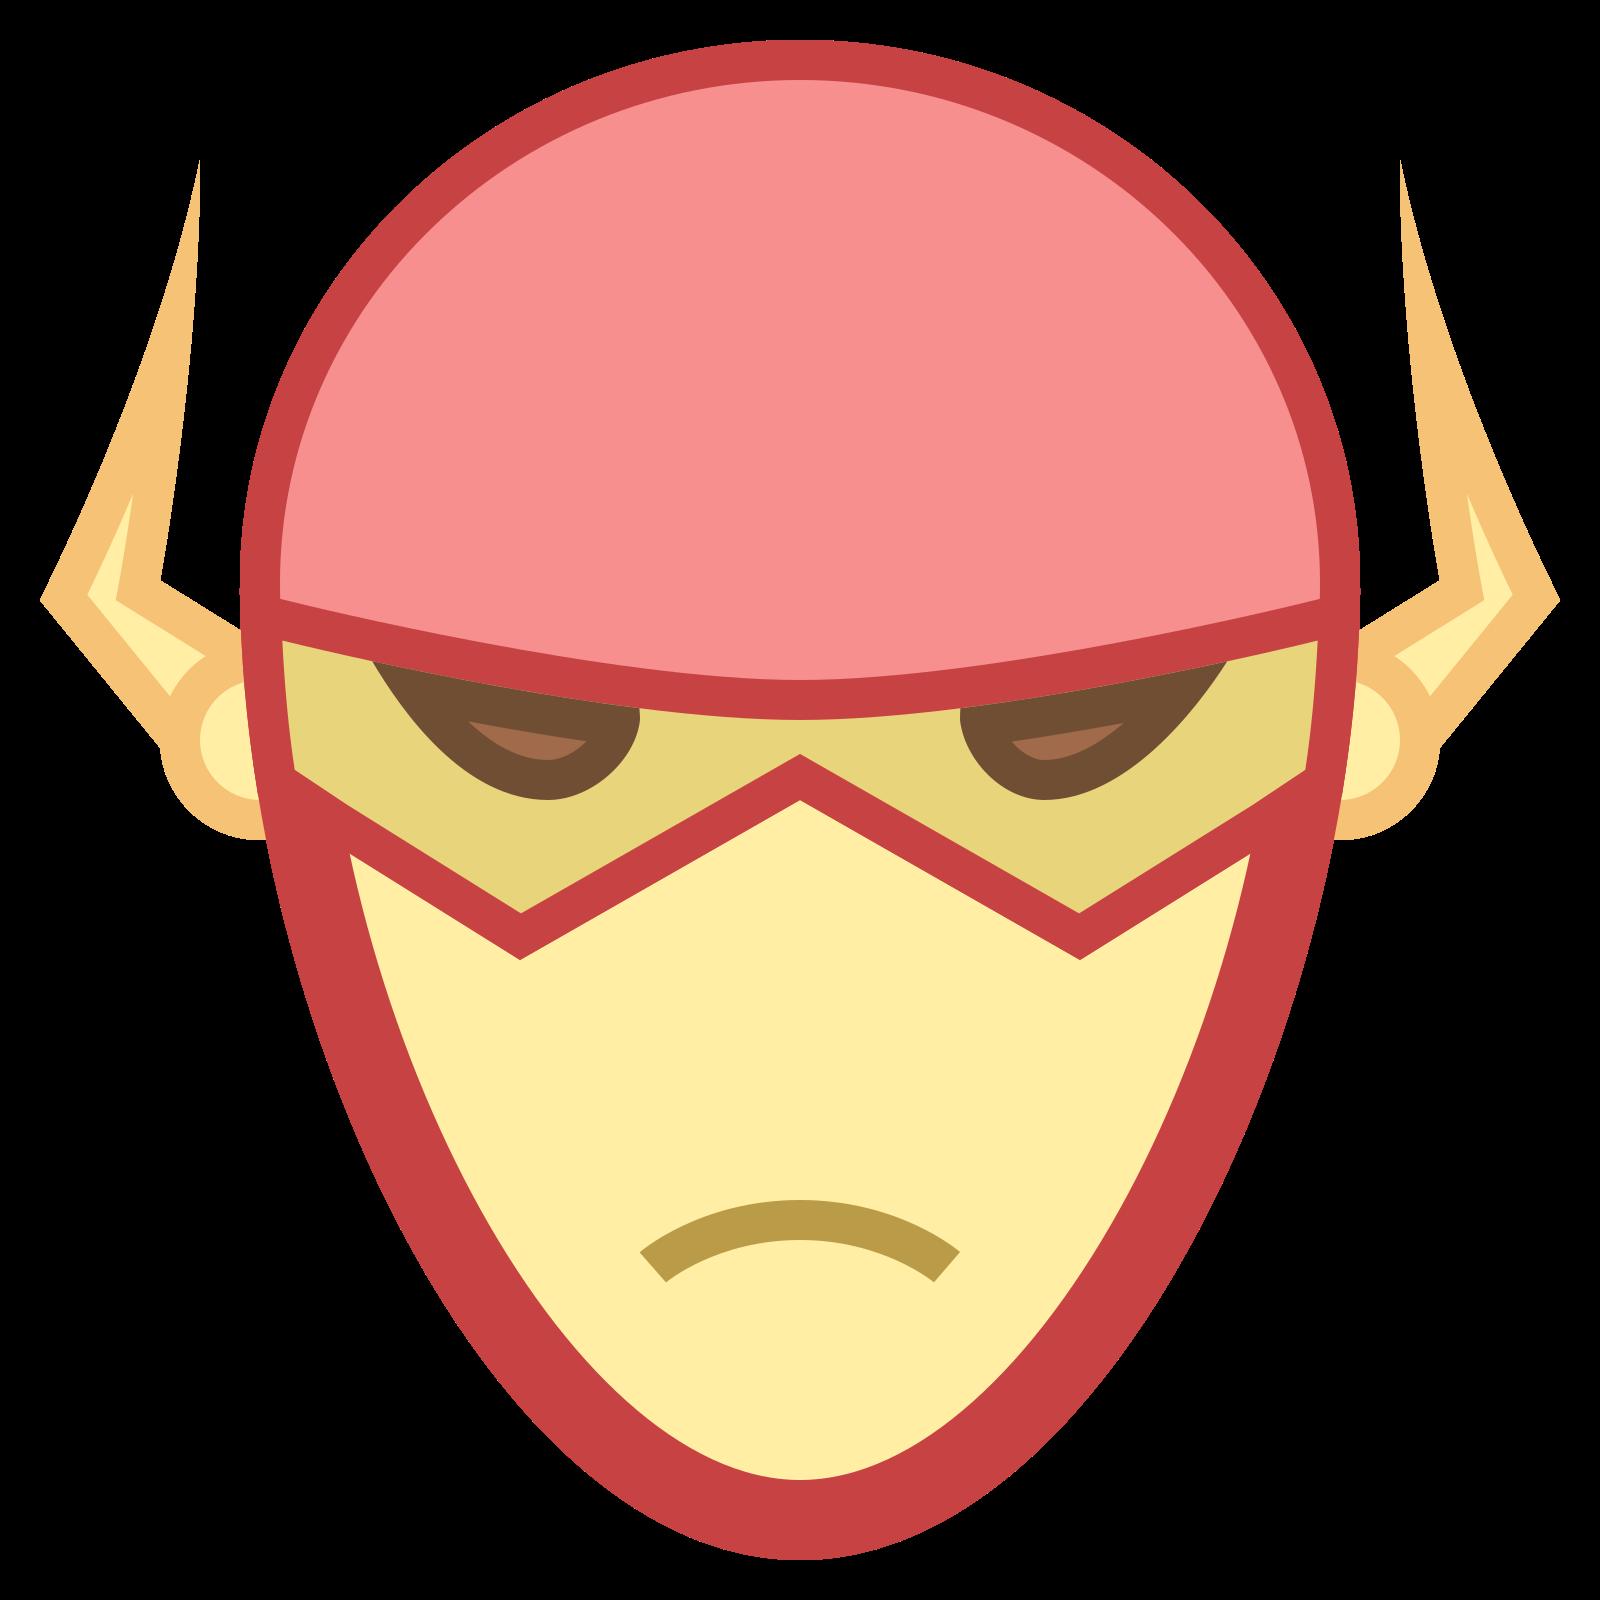 Flash Głowa icon